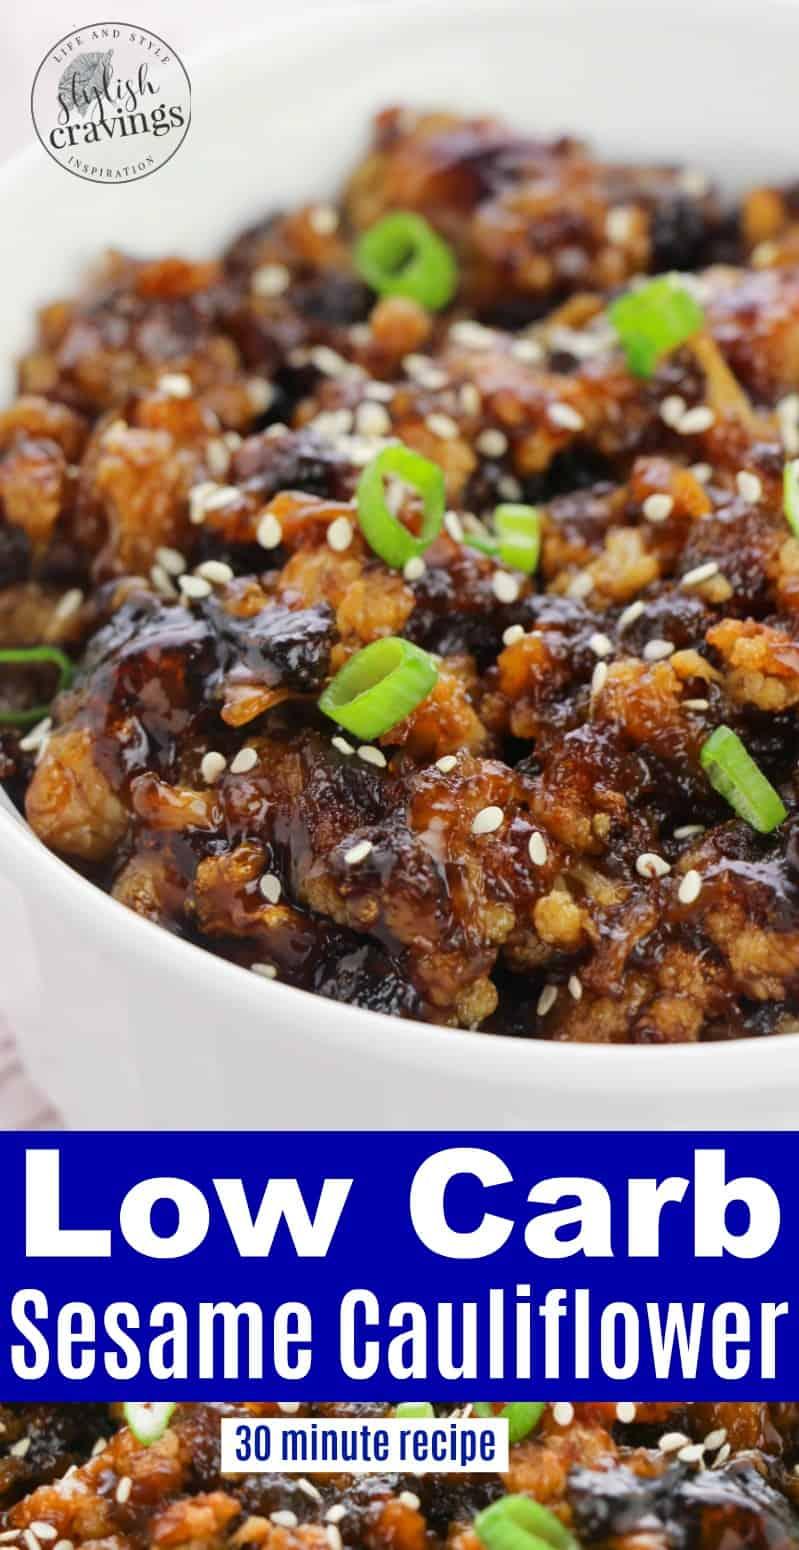 Sesame Cauliflower - Delicious Takeout Alternative!